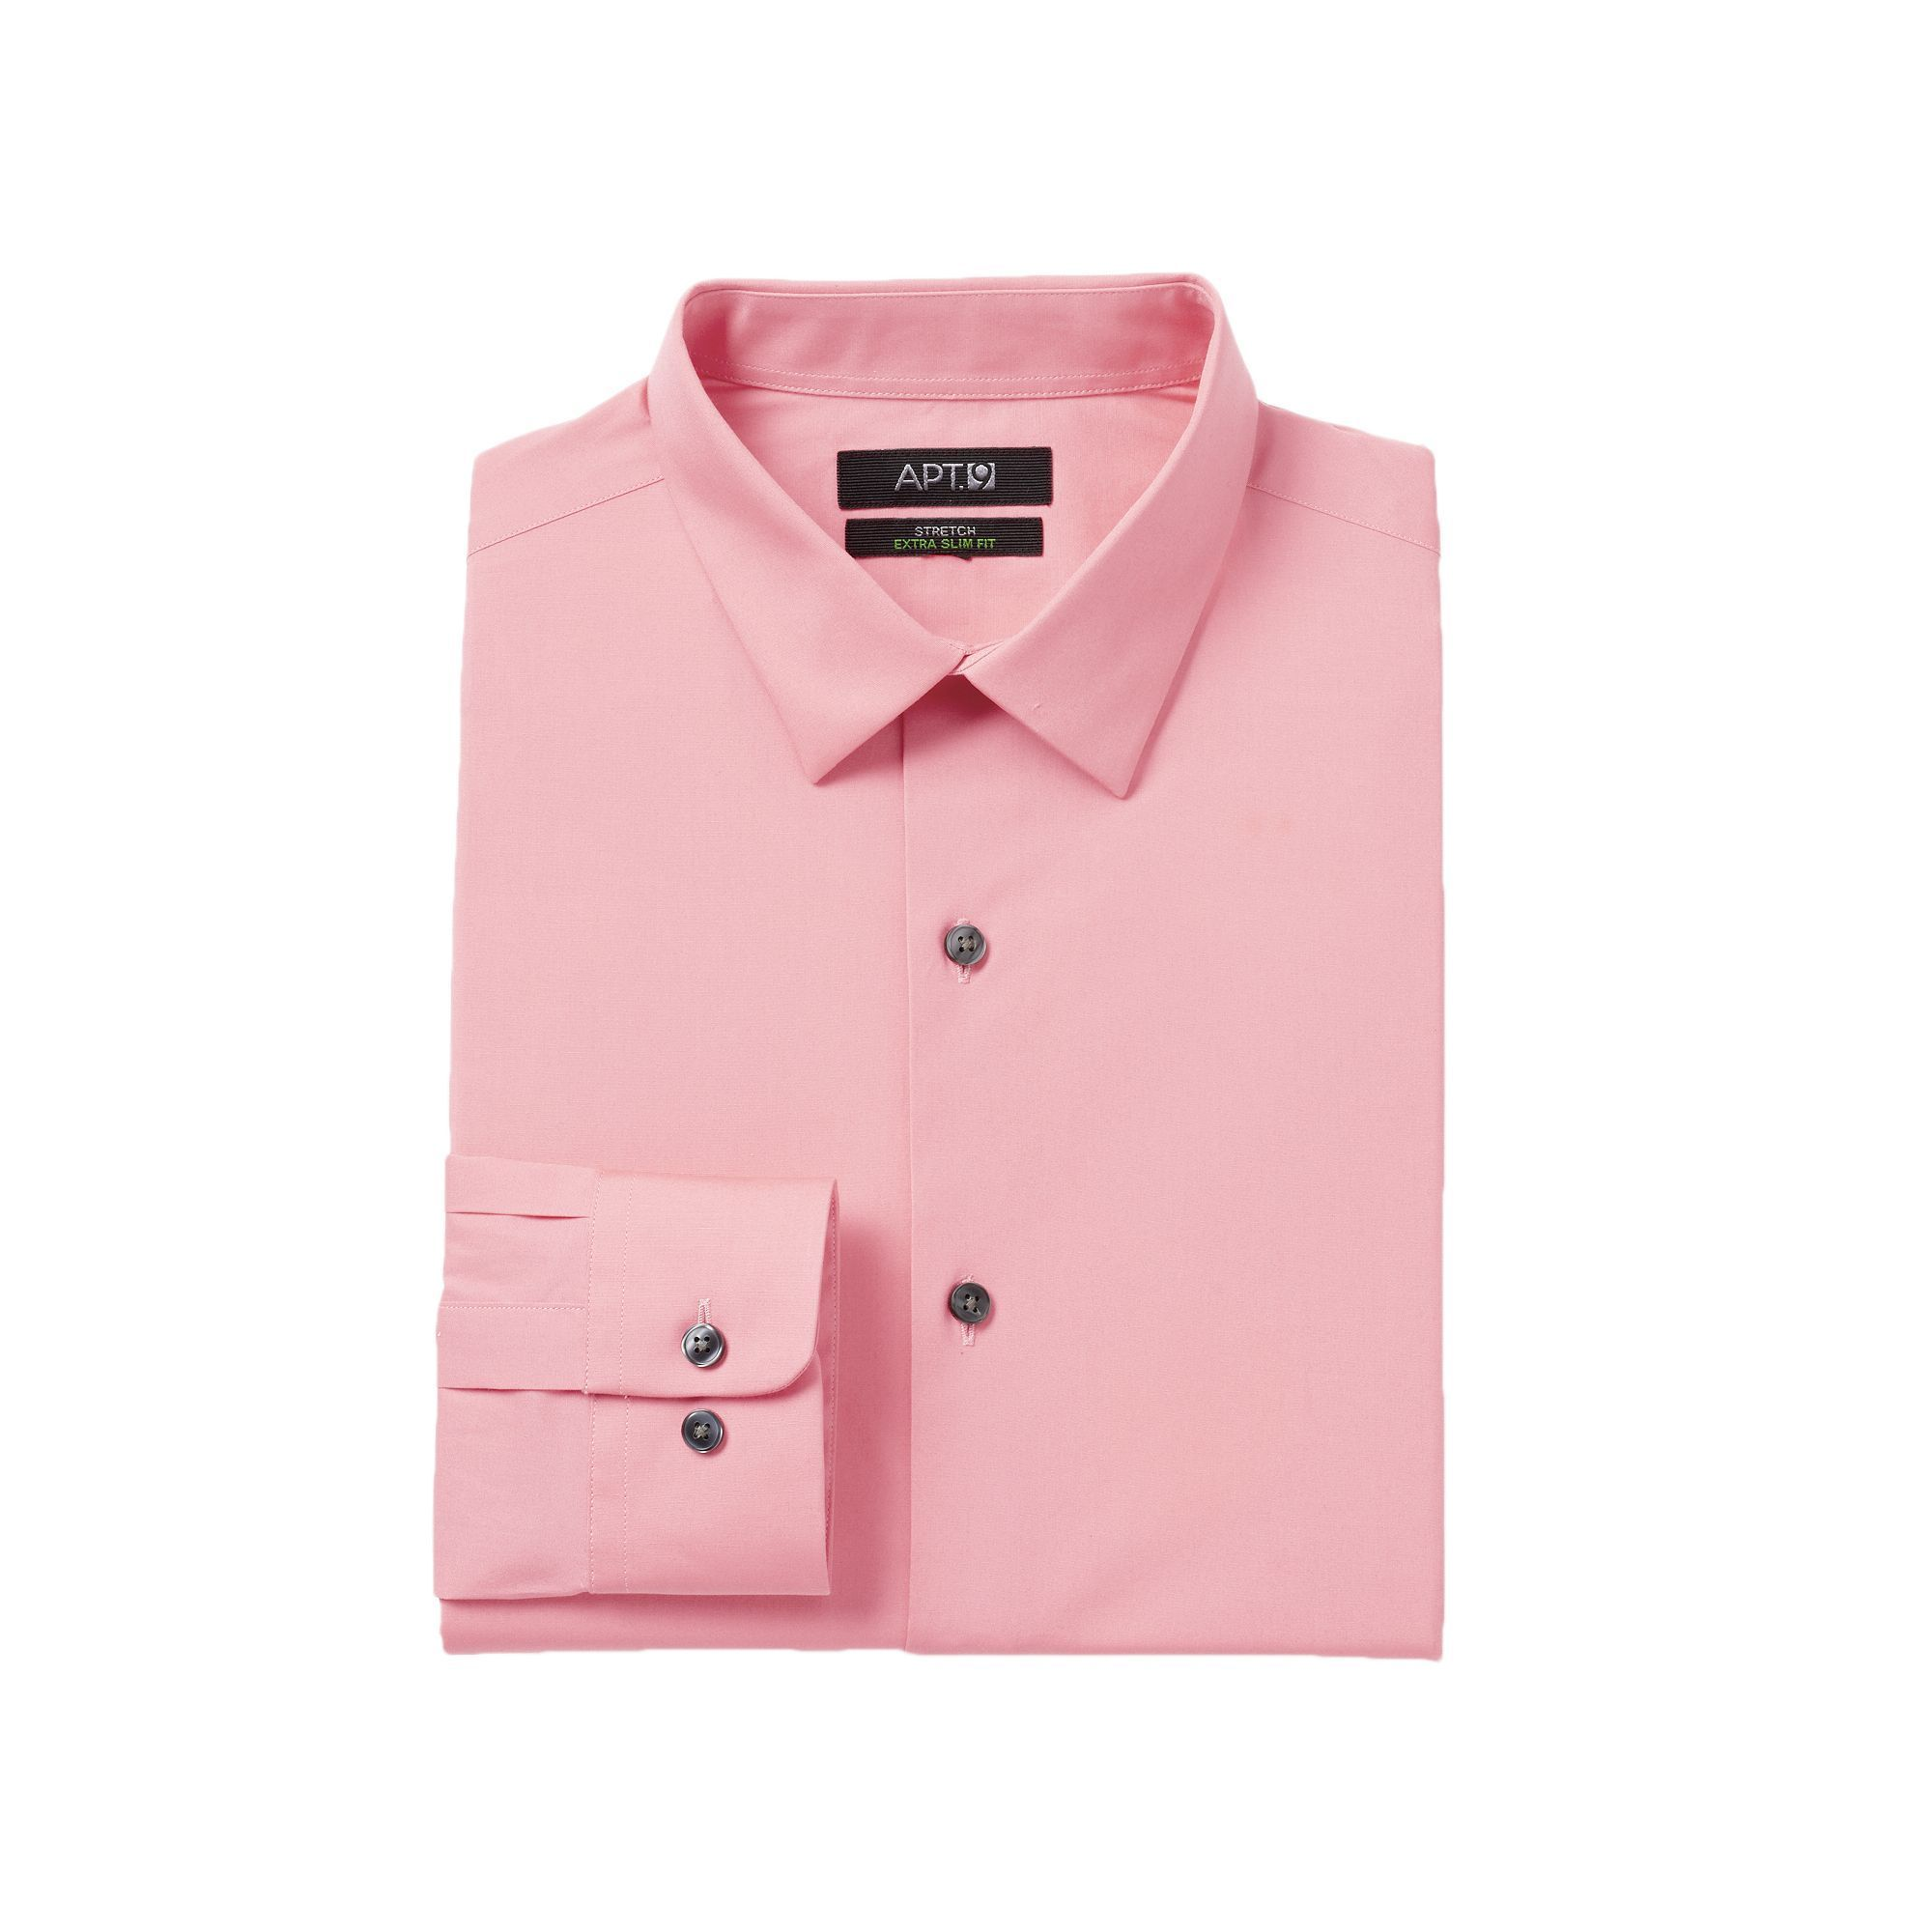 Mens Slim Fit Light Pink Dress Shirt Joe Maloy